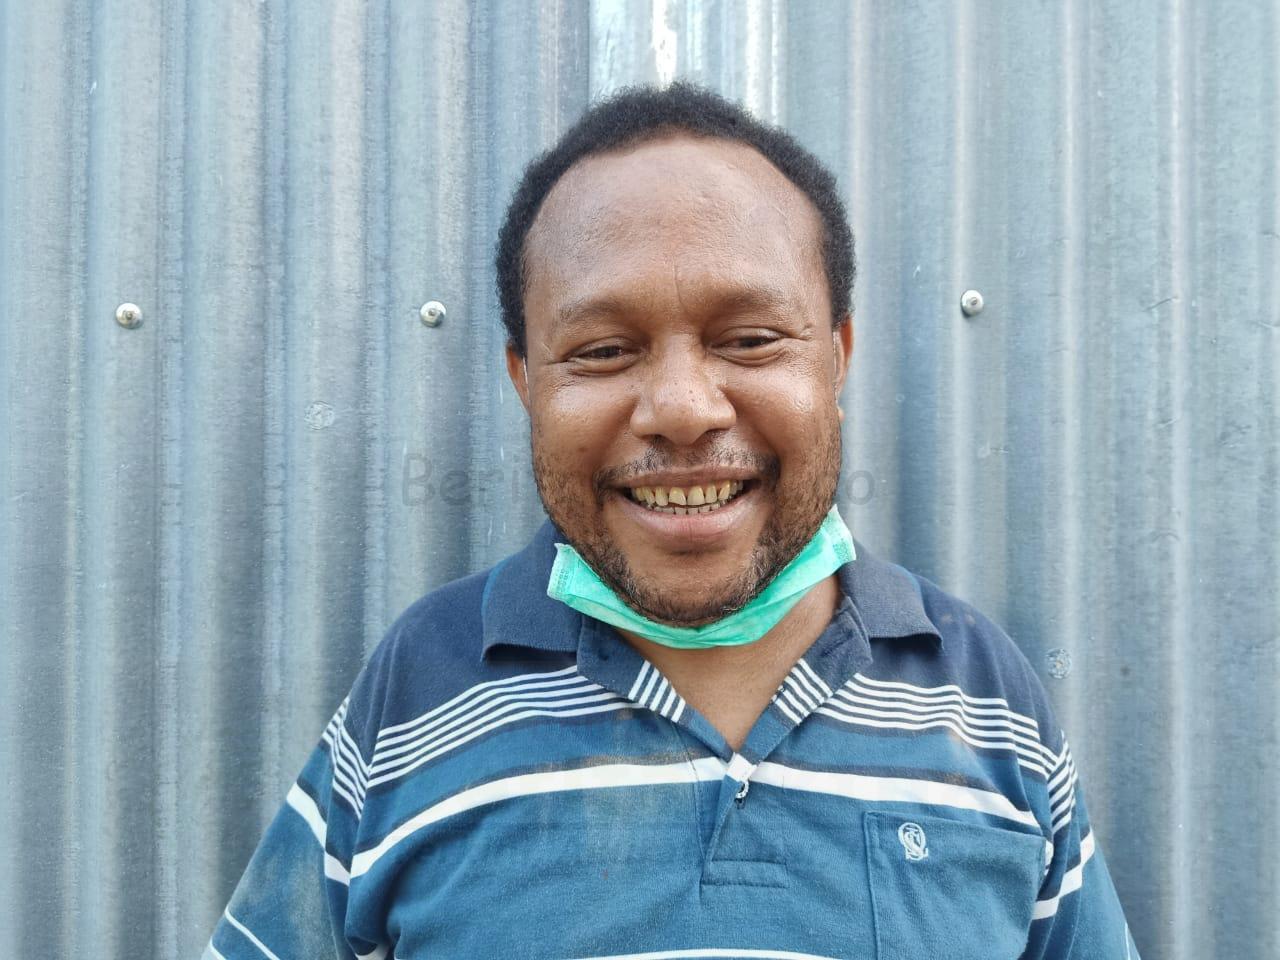 Franky Awom: HEBO Kuat, Menang 80 Persen di Pilkada Manokwari 24 IMG 20201205 WA0026